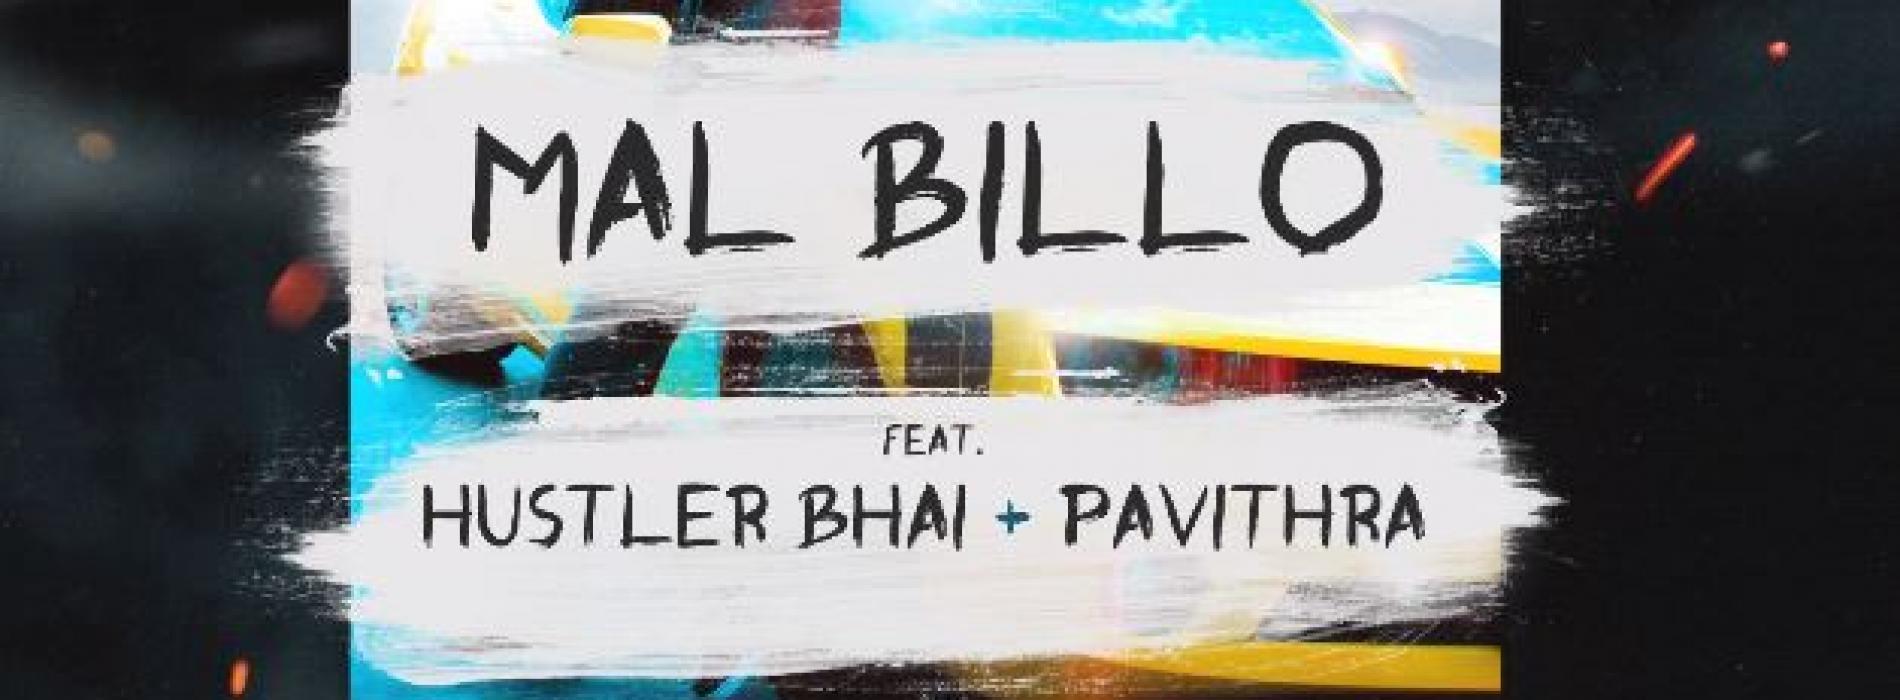 Azim Ousman – Mal Billo (Audio) Ft HustLer Bhai & Pavithra